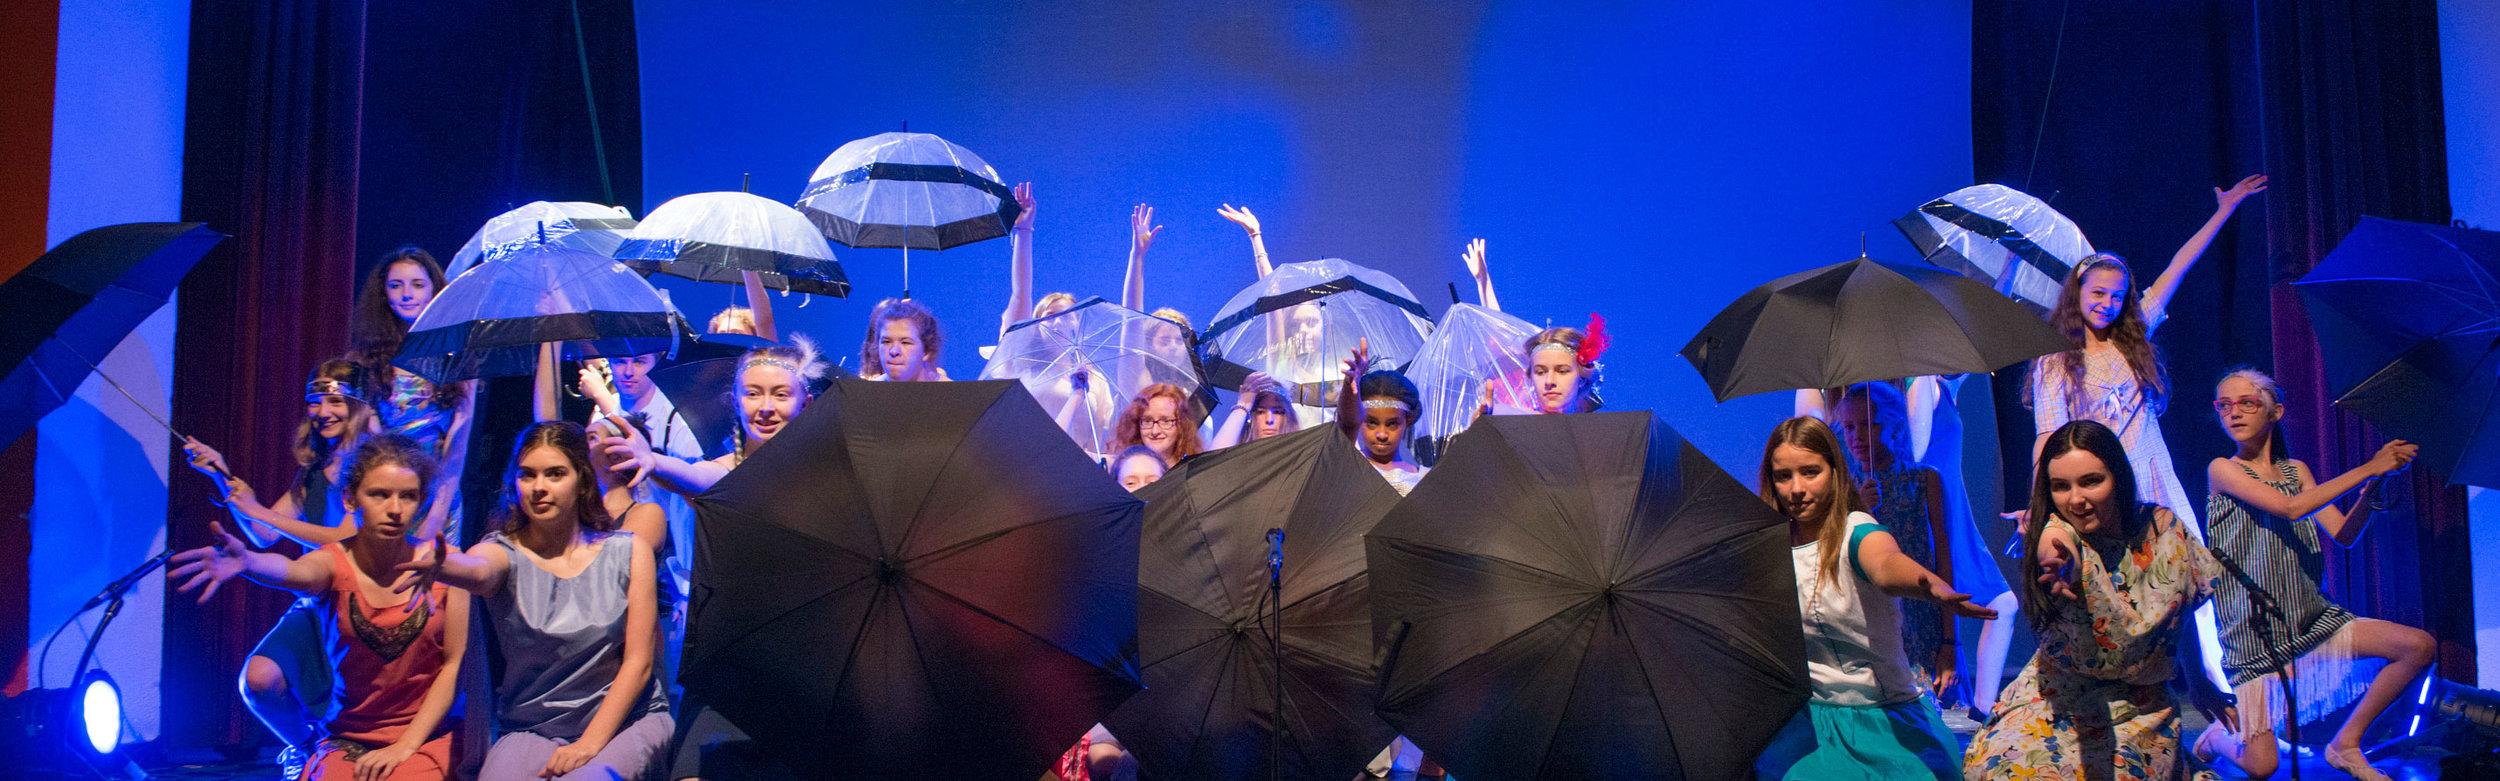 Singing-in-the-Rain_home-mid.jpg